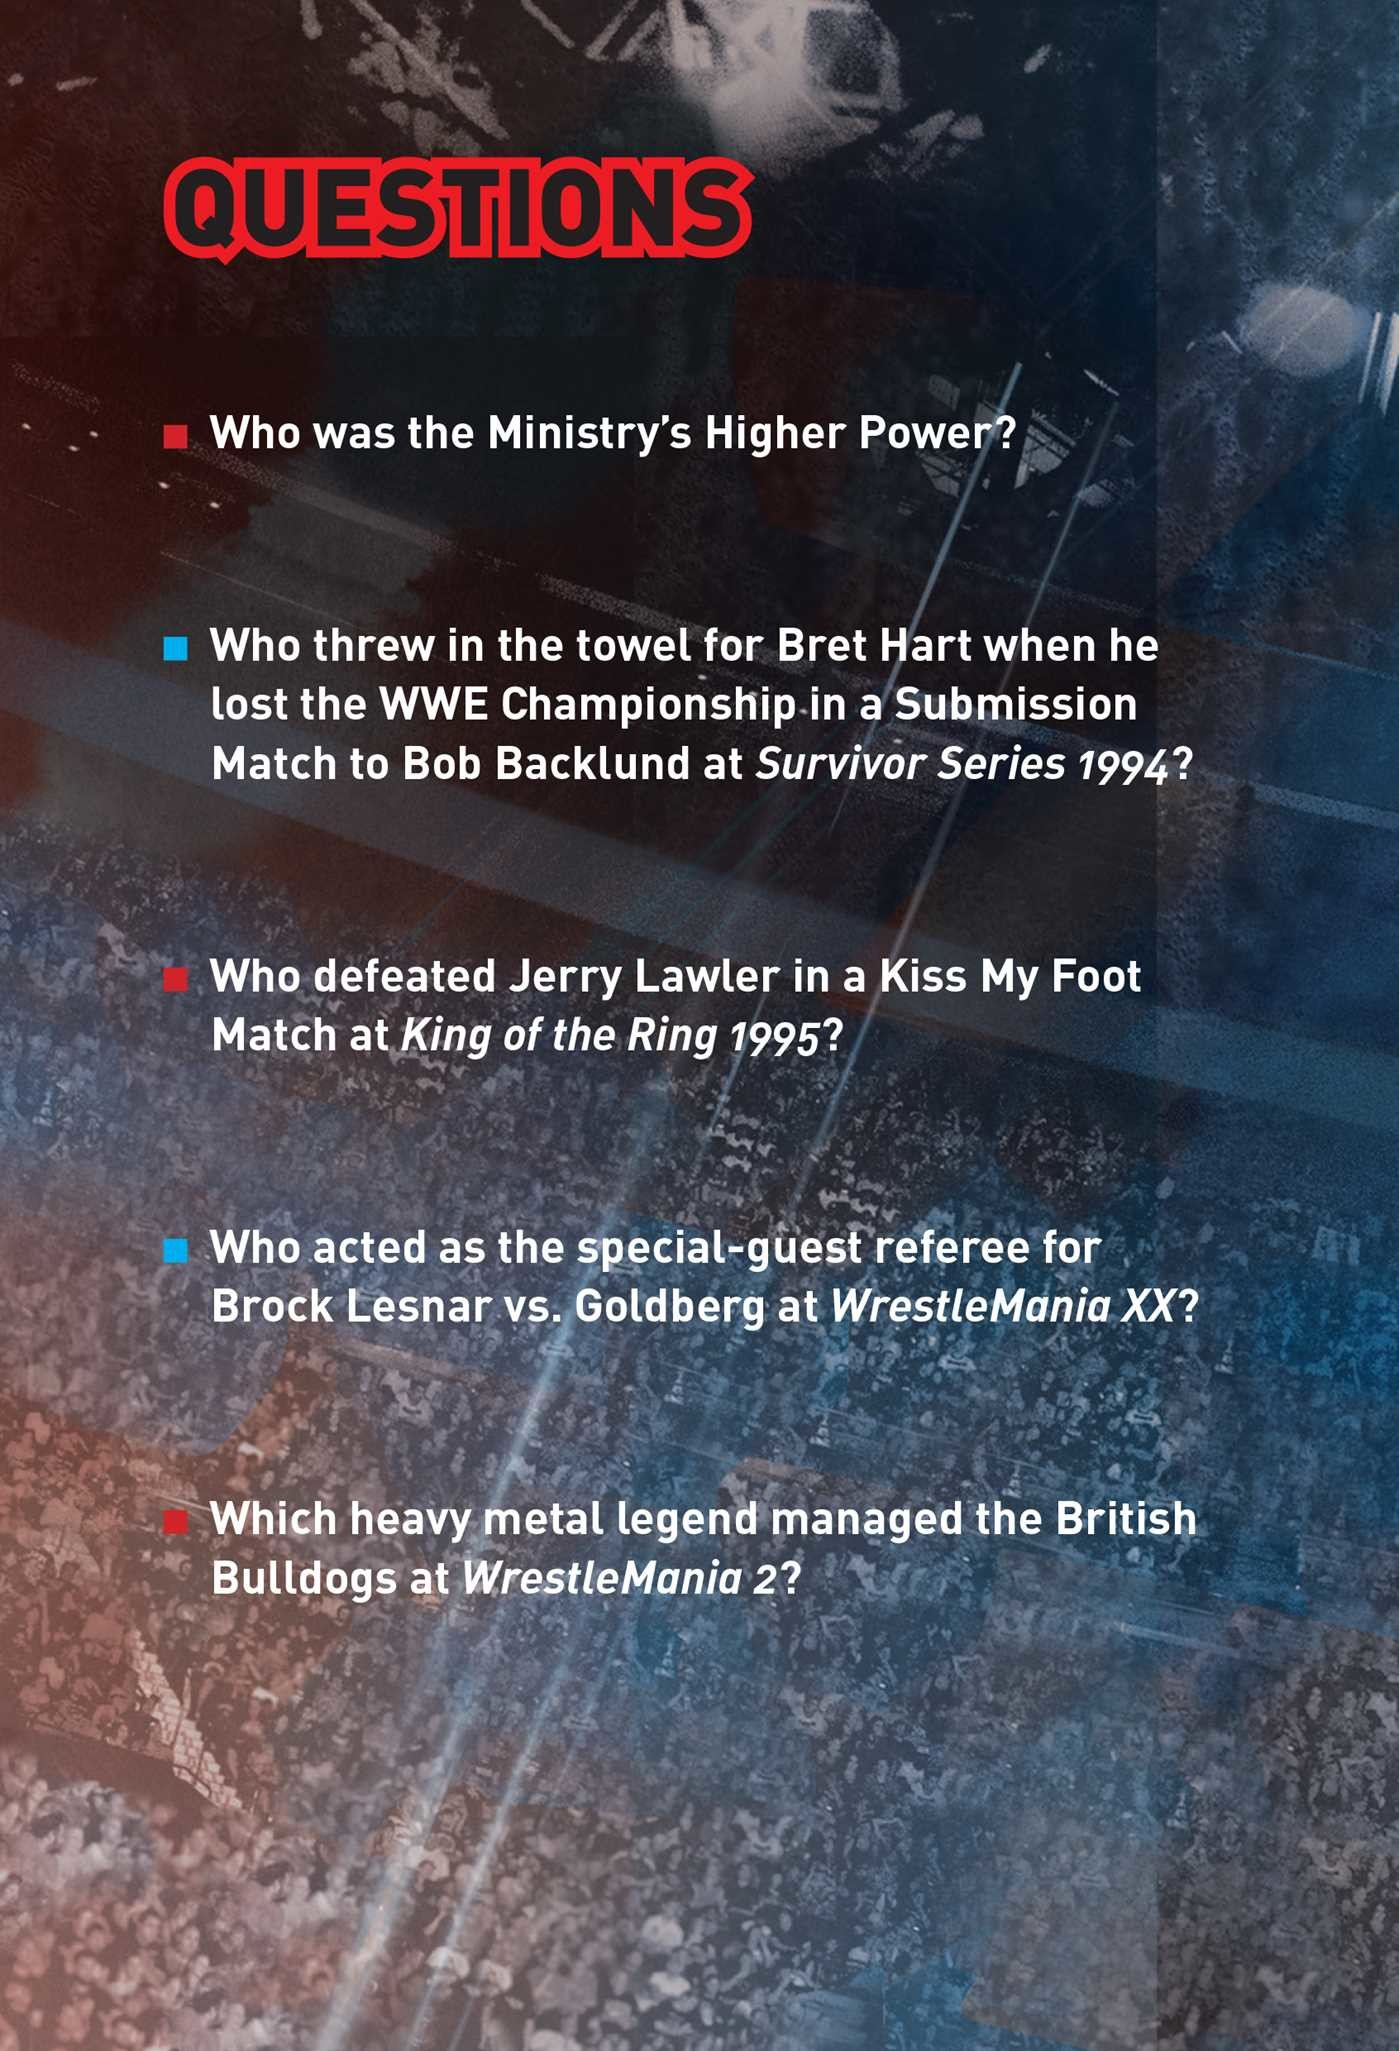 Wwe pop quiz trivia deck 9781683834410.in04